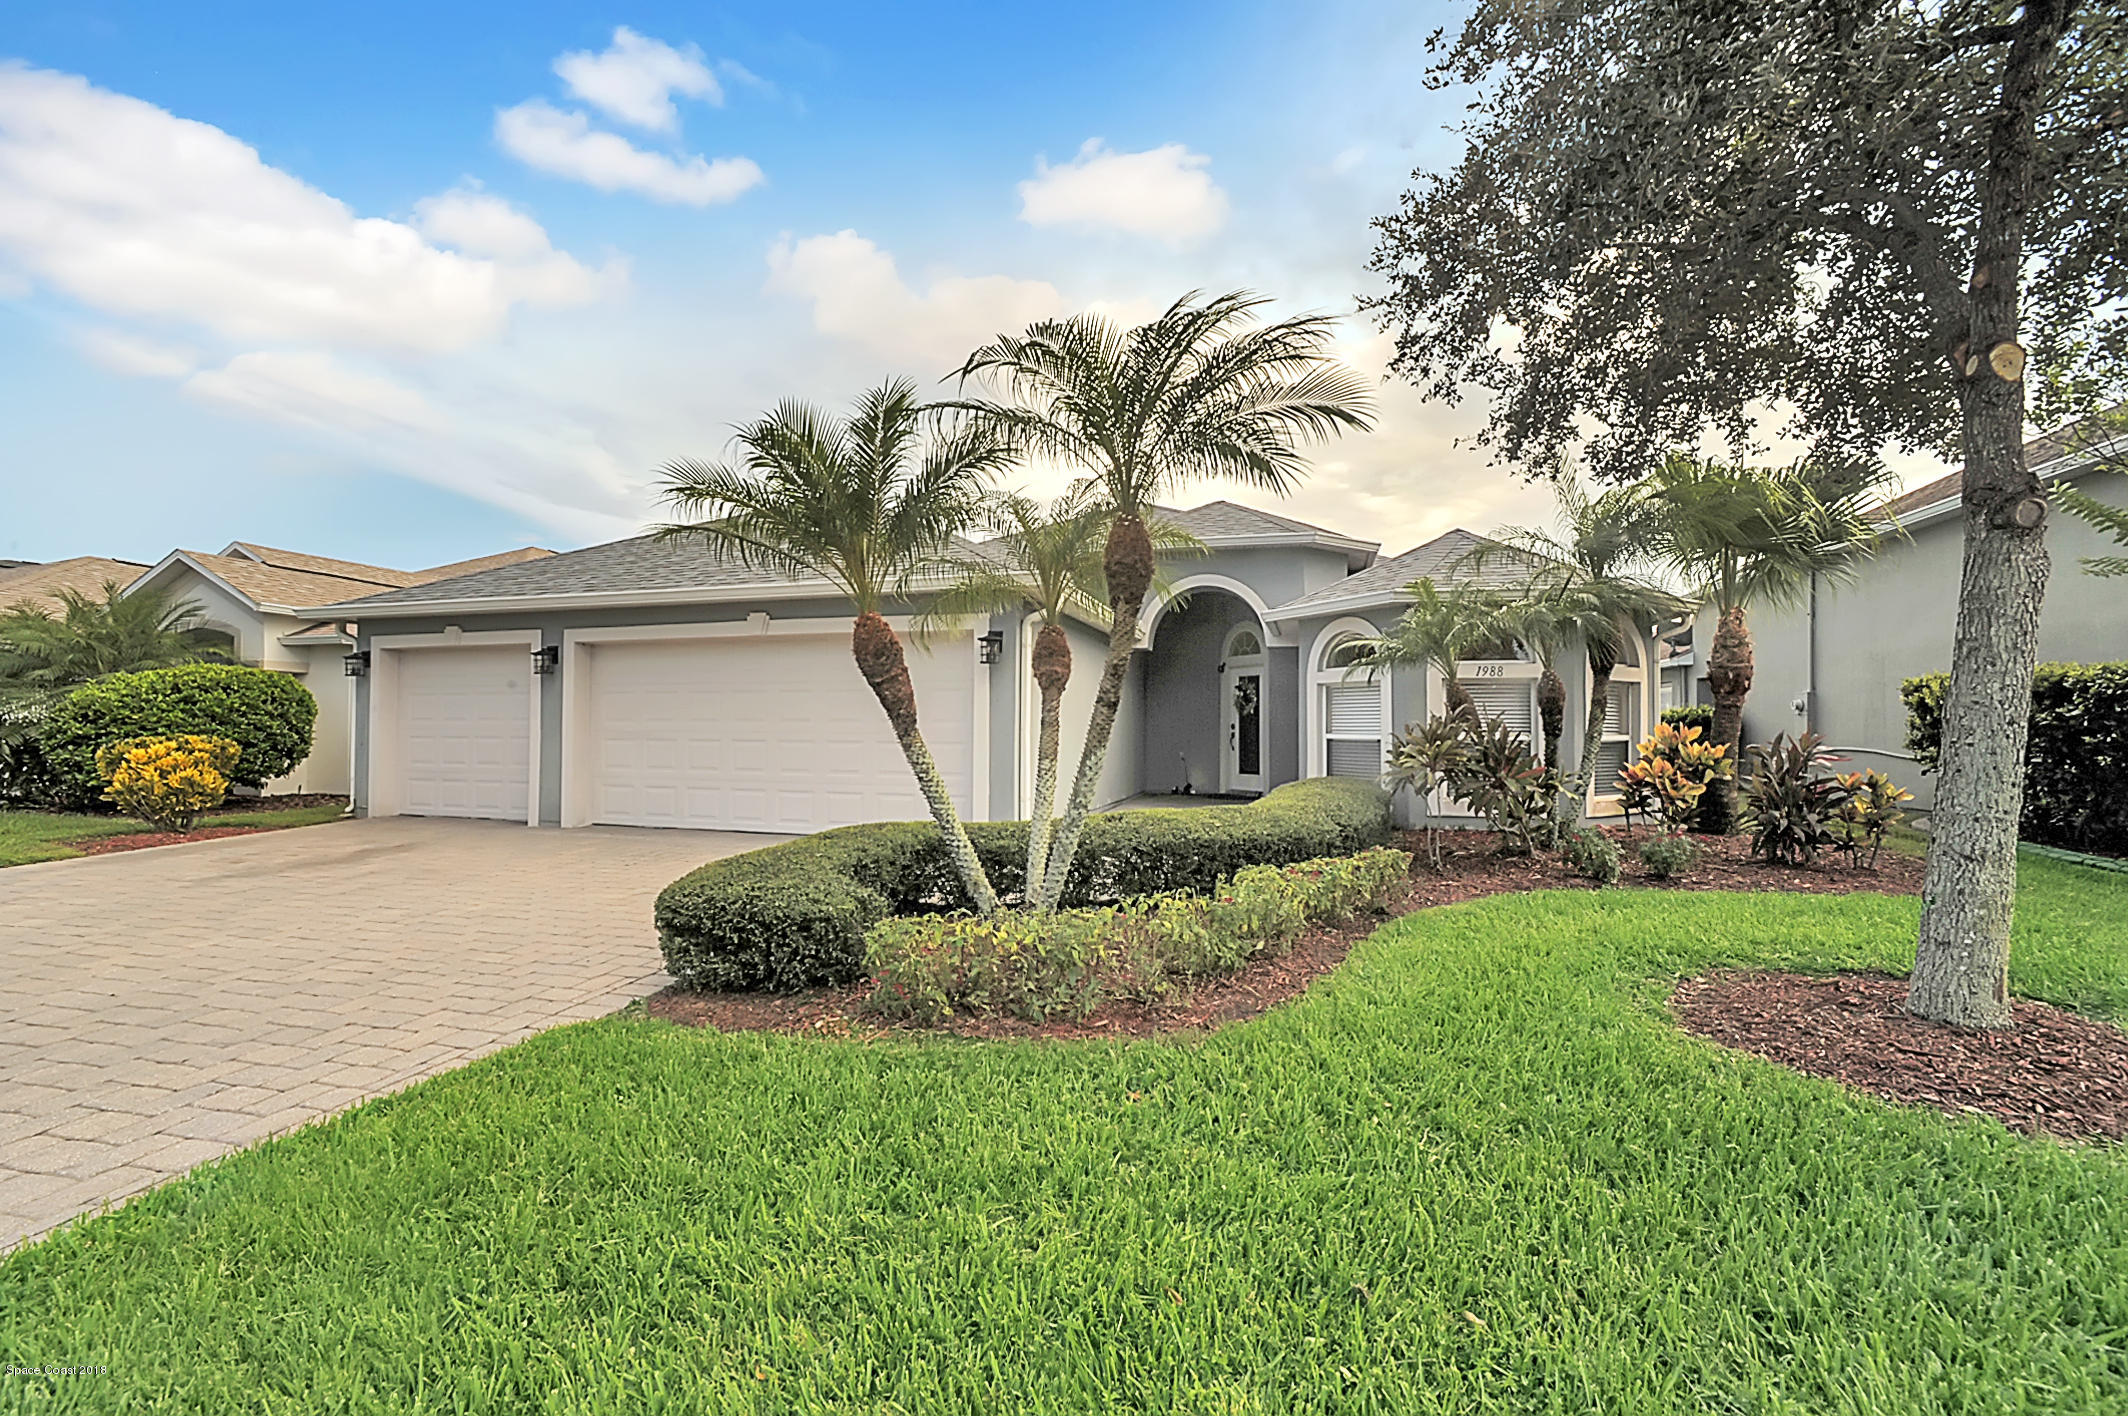 Property for Sale at 1988 Auburn Lakes 1988 Auburn Lakes Viera, Florida 32955 United States